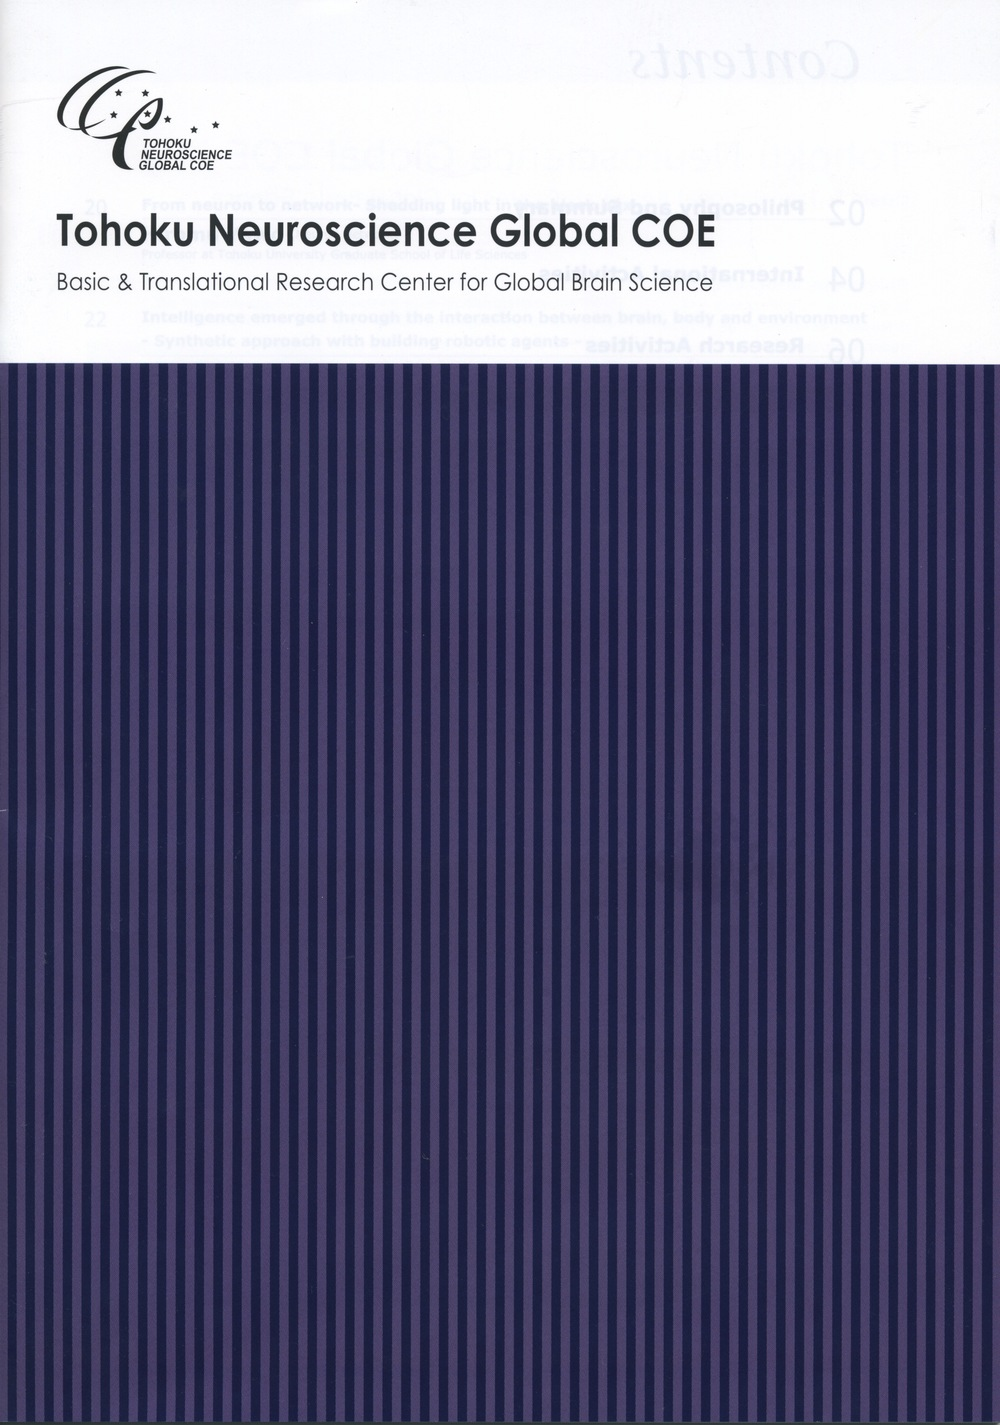 Tohoku University COE annual report